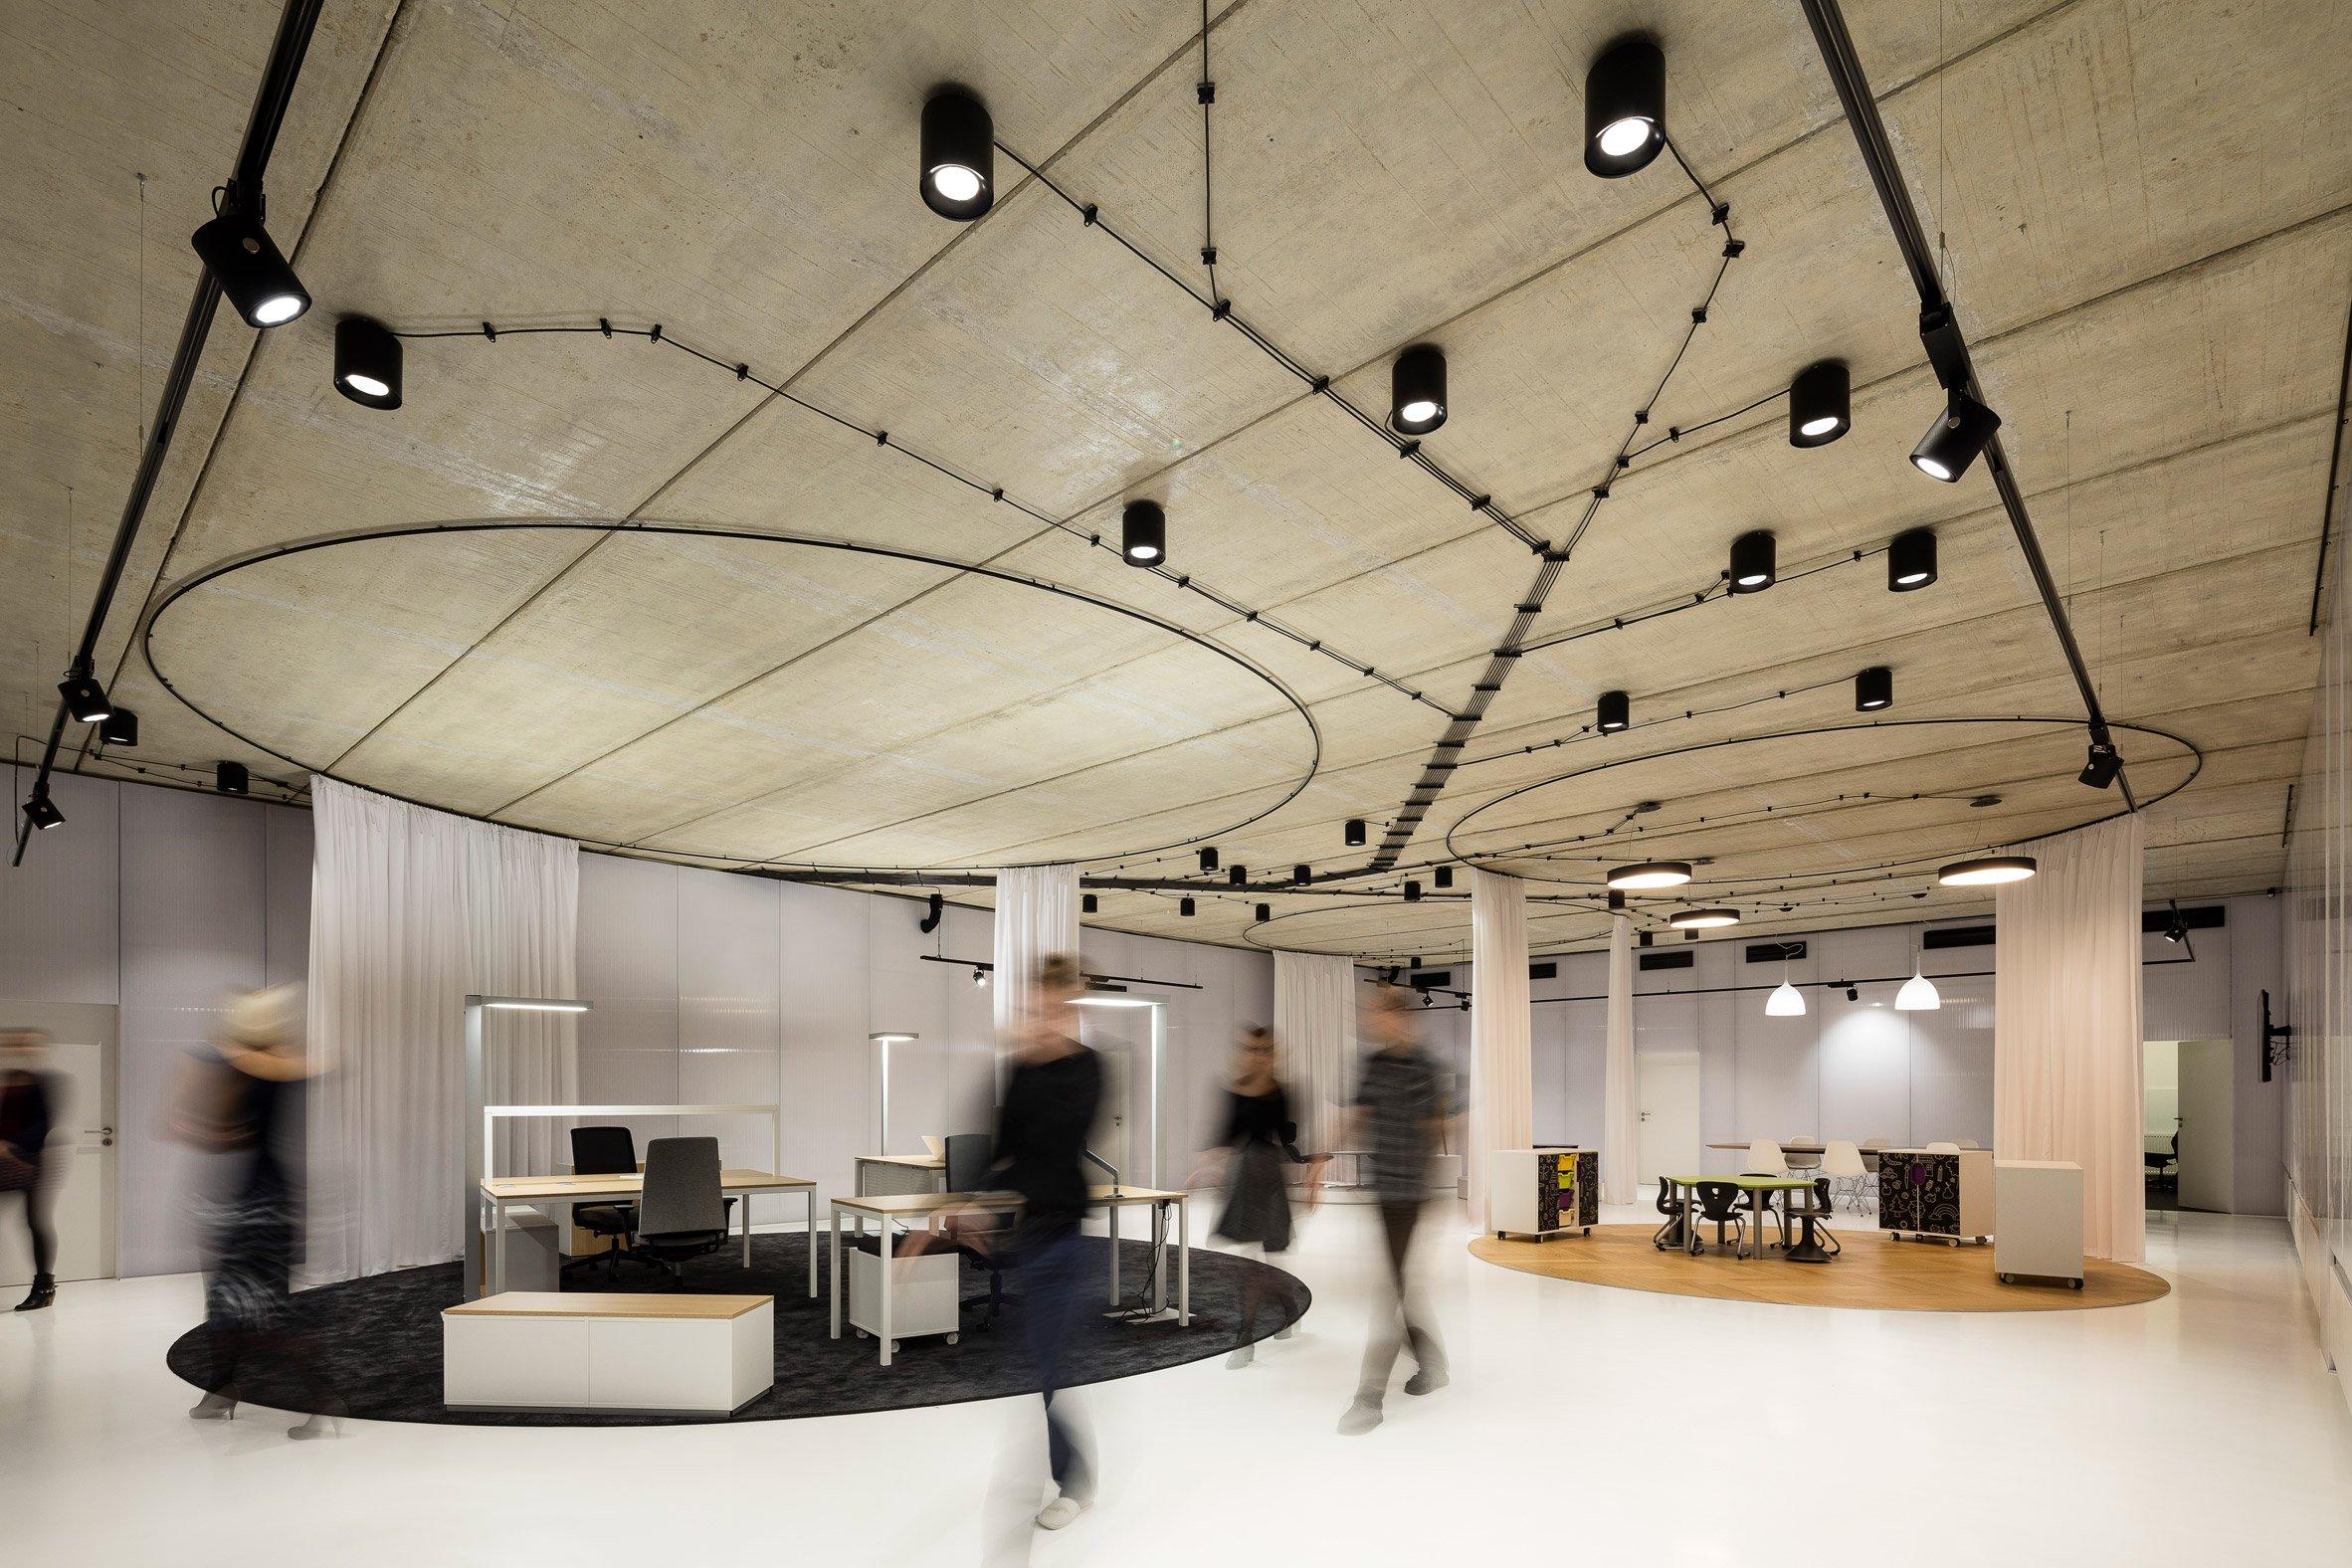 gallery-furniture-chybik-kistof-architecture-retail-czech-republic_dezeen_2364_col_4.jpg